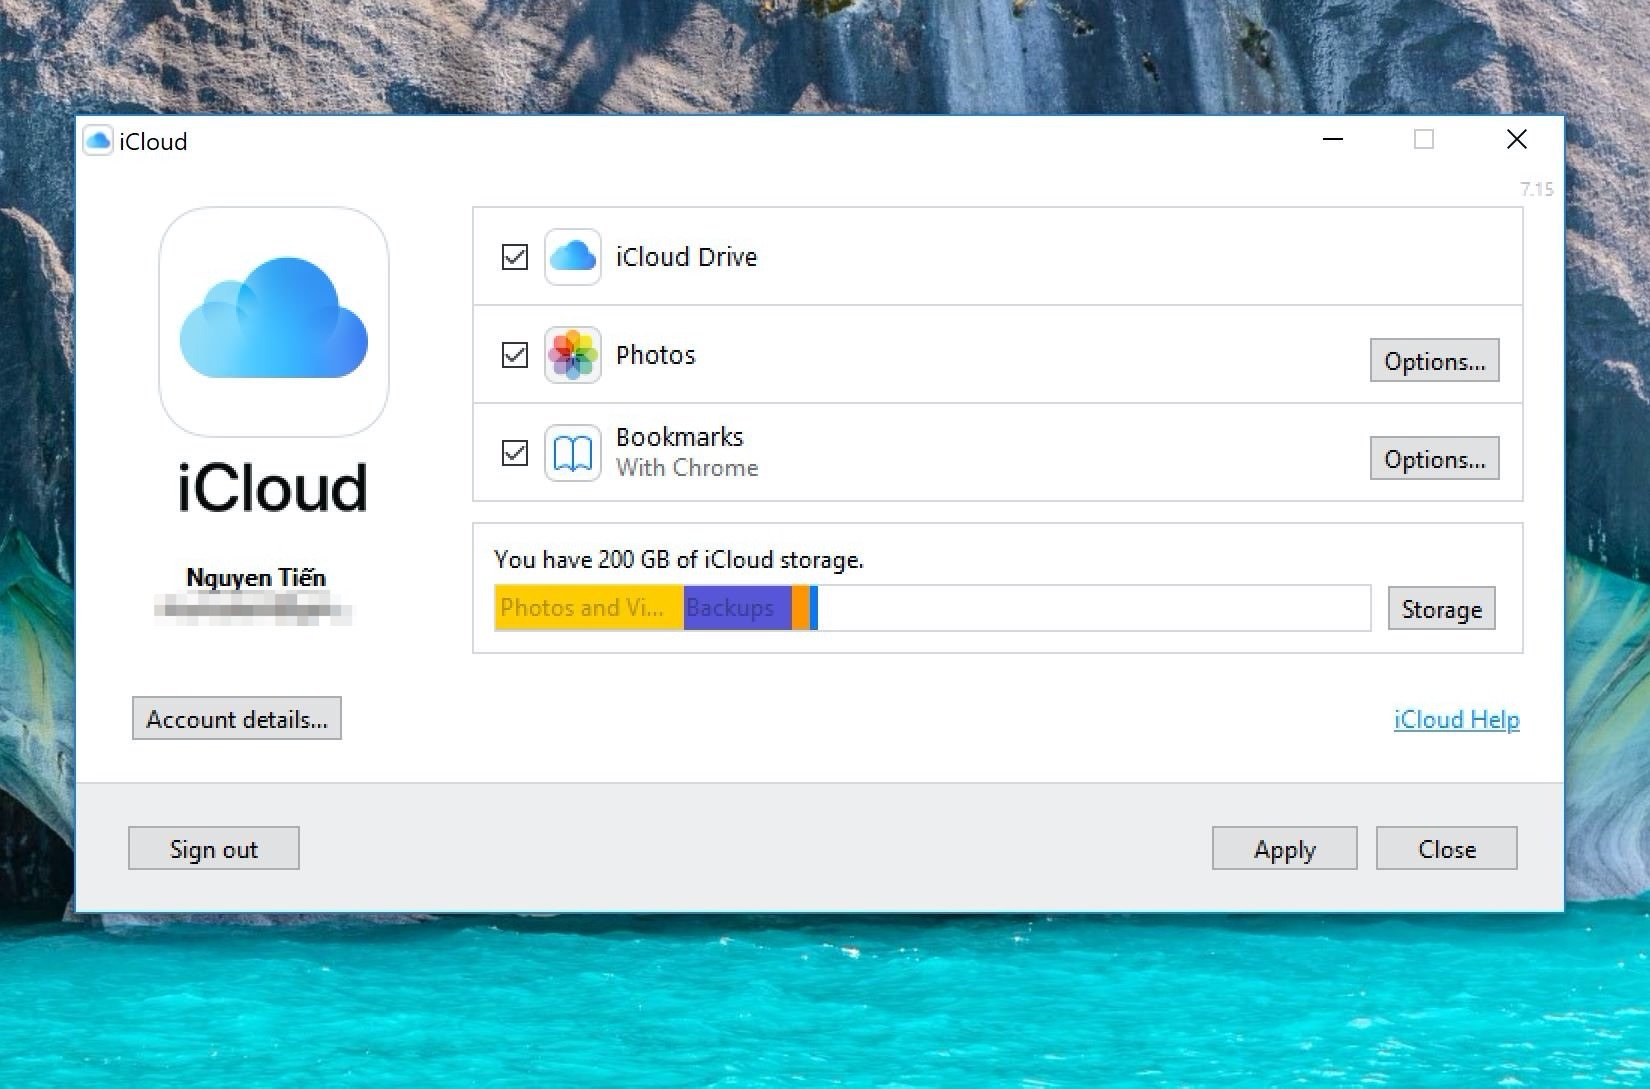 Đang tải iCloud_windows_2.jpg…